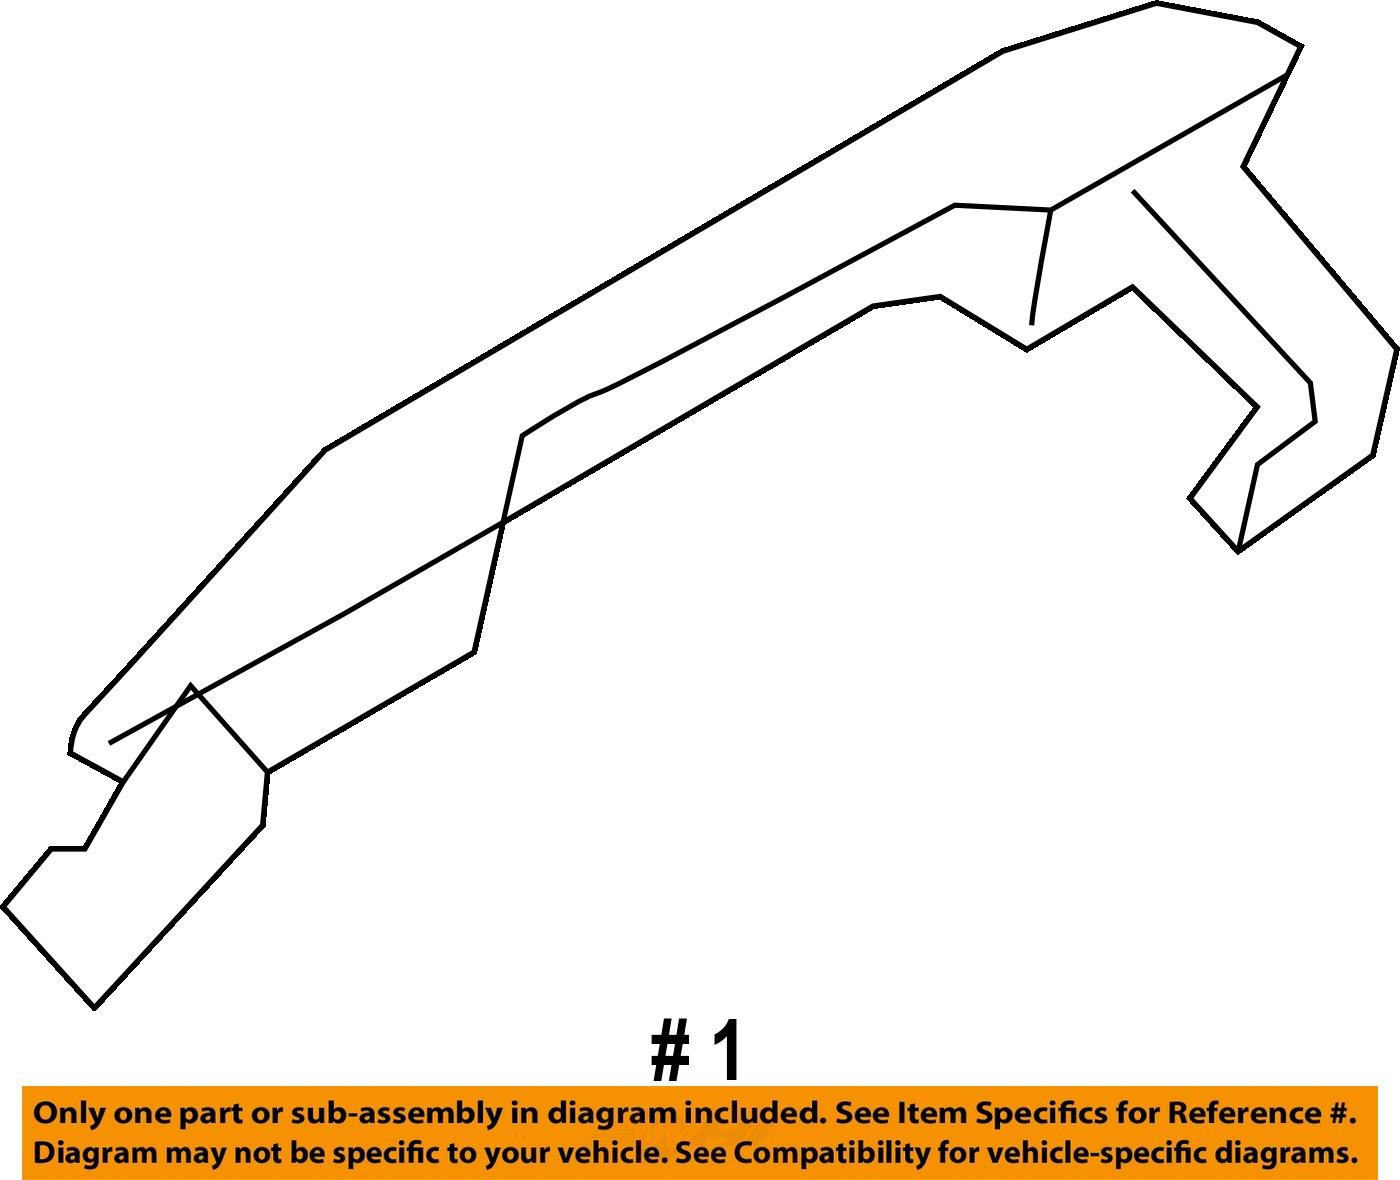 2013 hyundai elantra coupe owners manual